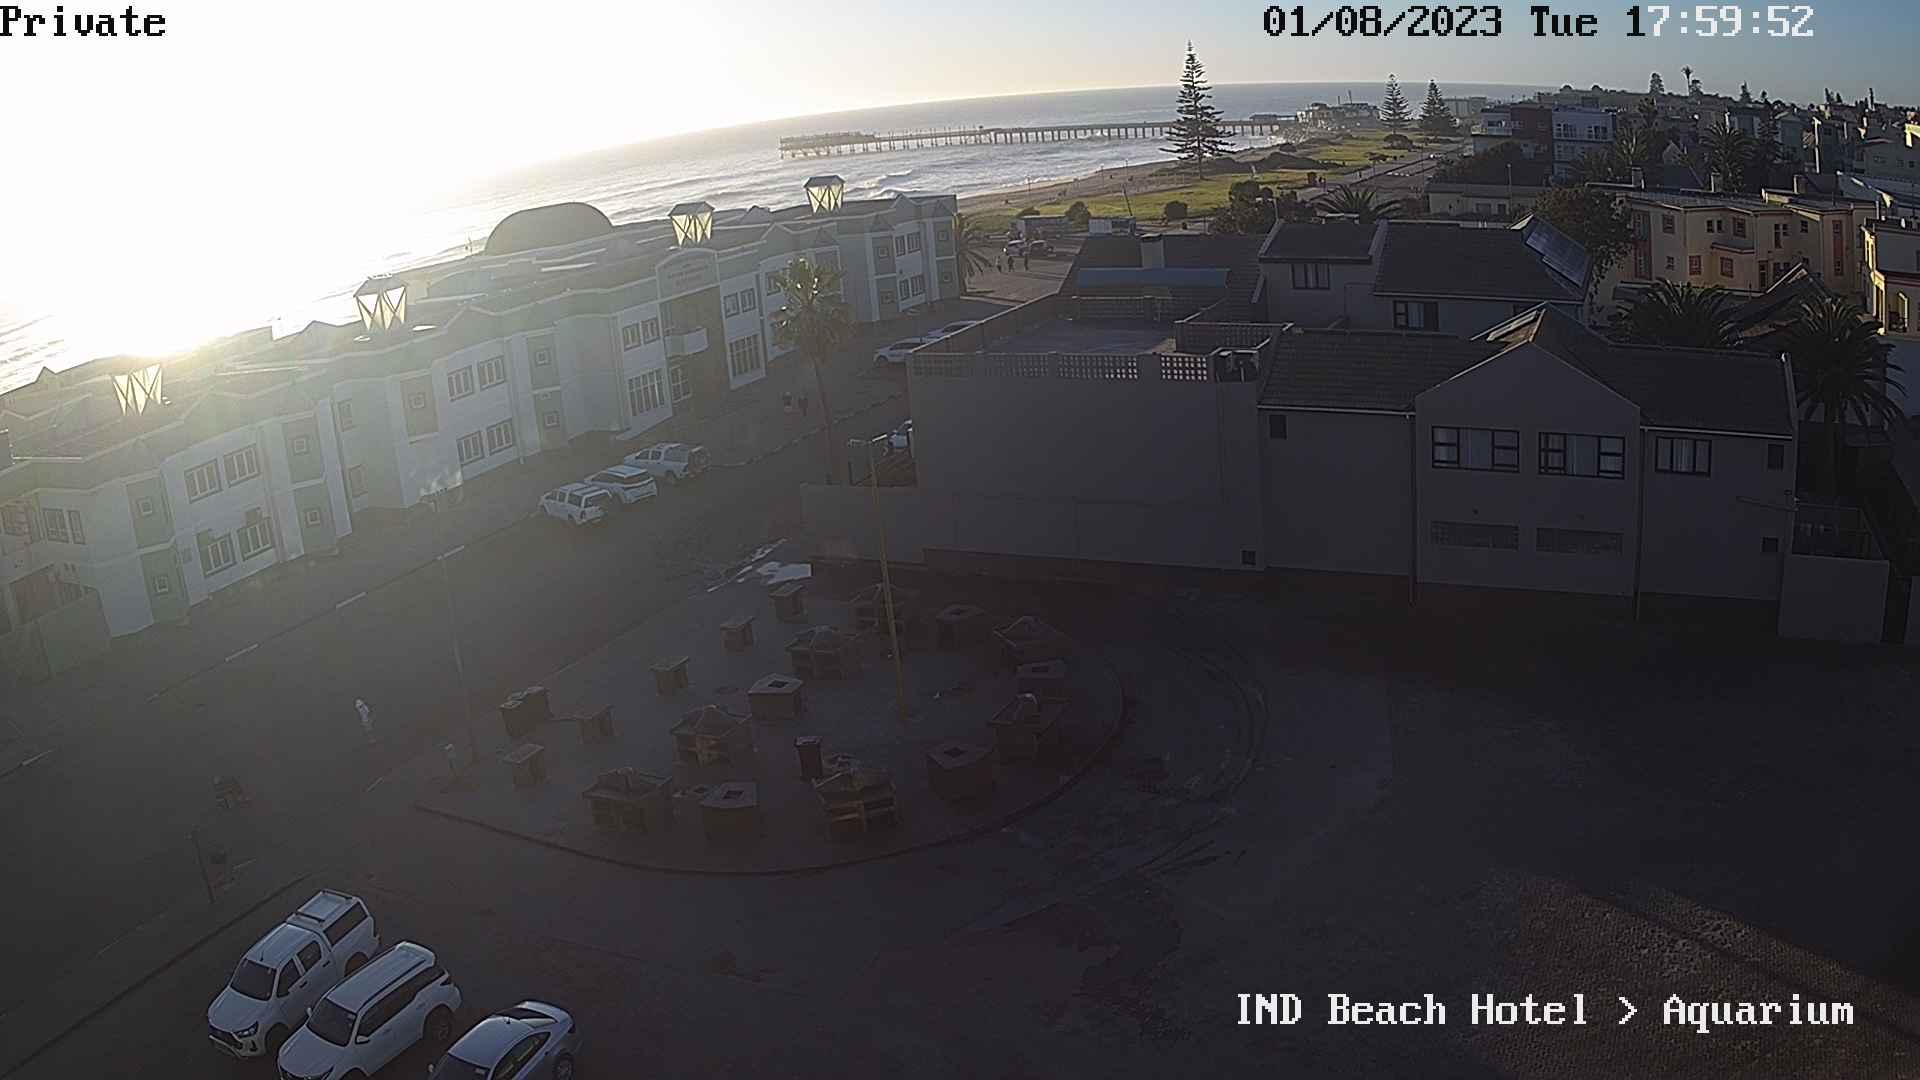 Livebild vom Strand